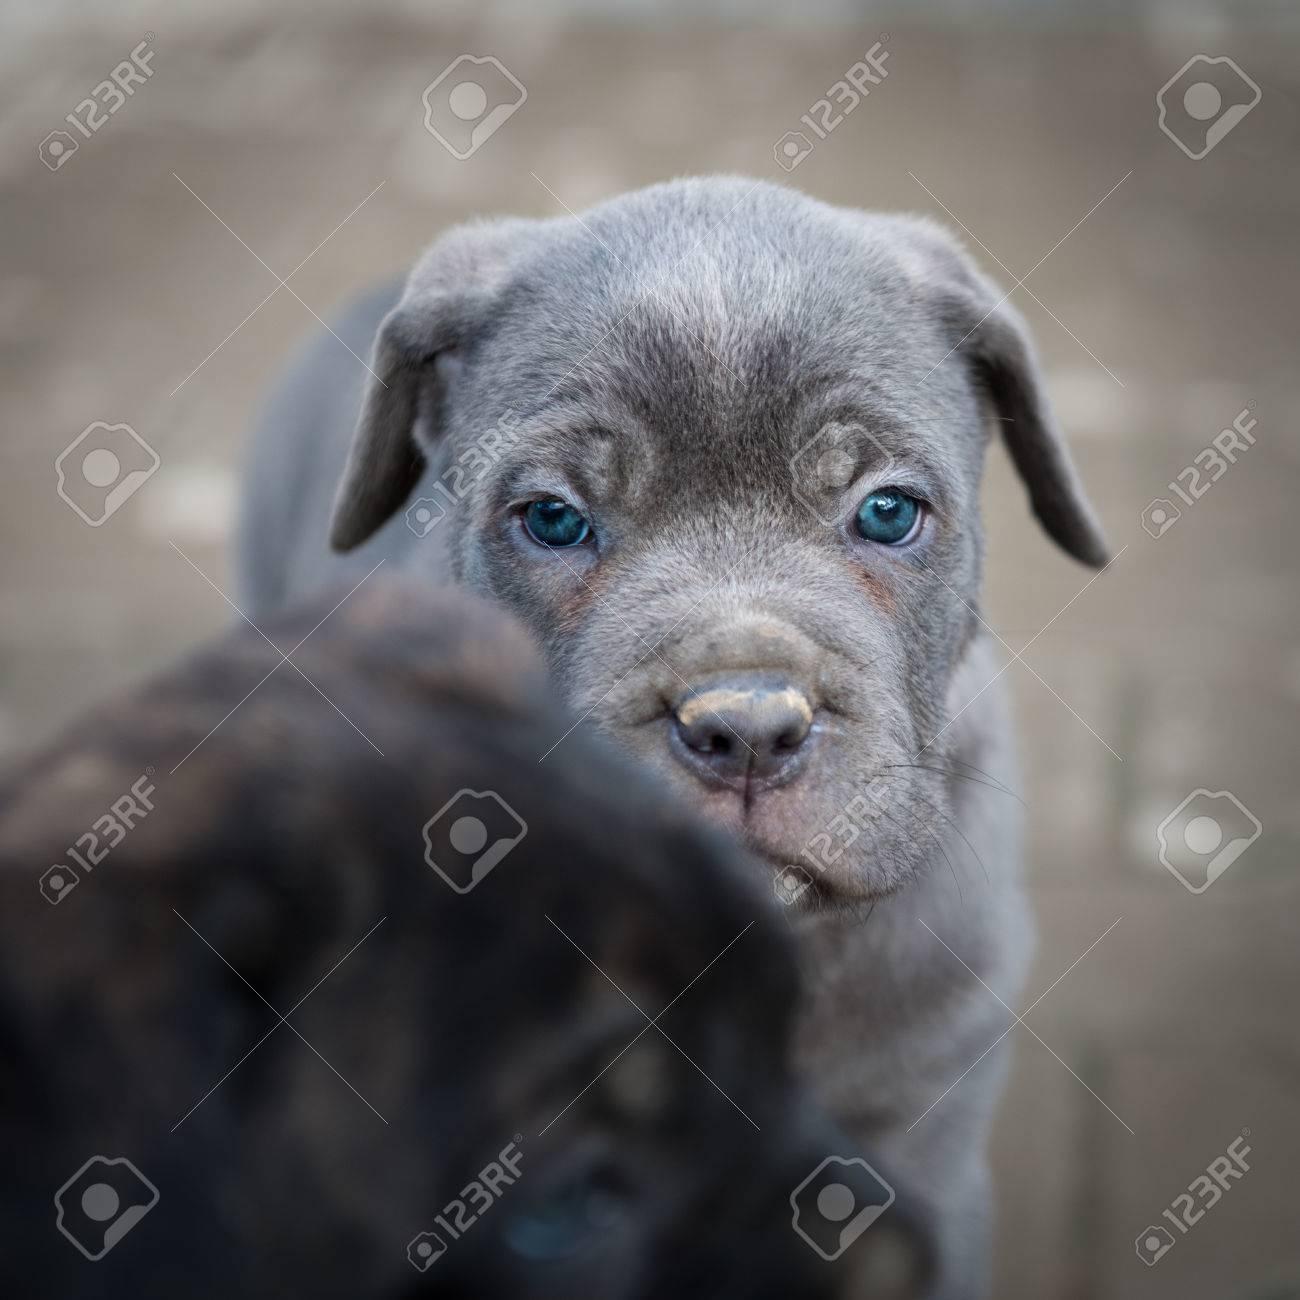 Black and grey Neapolitan Mastiff puppies